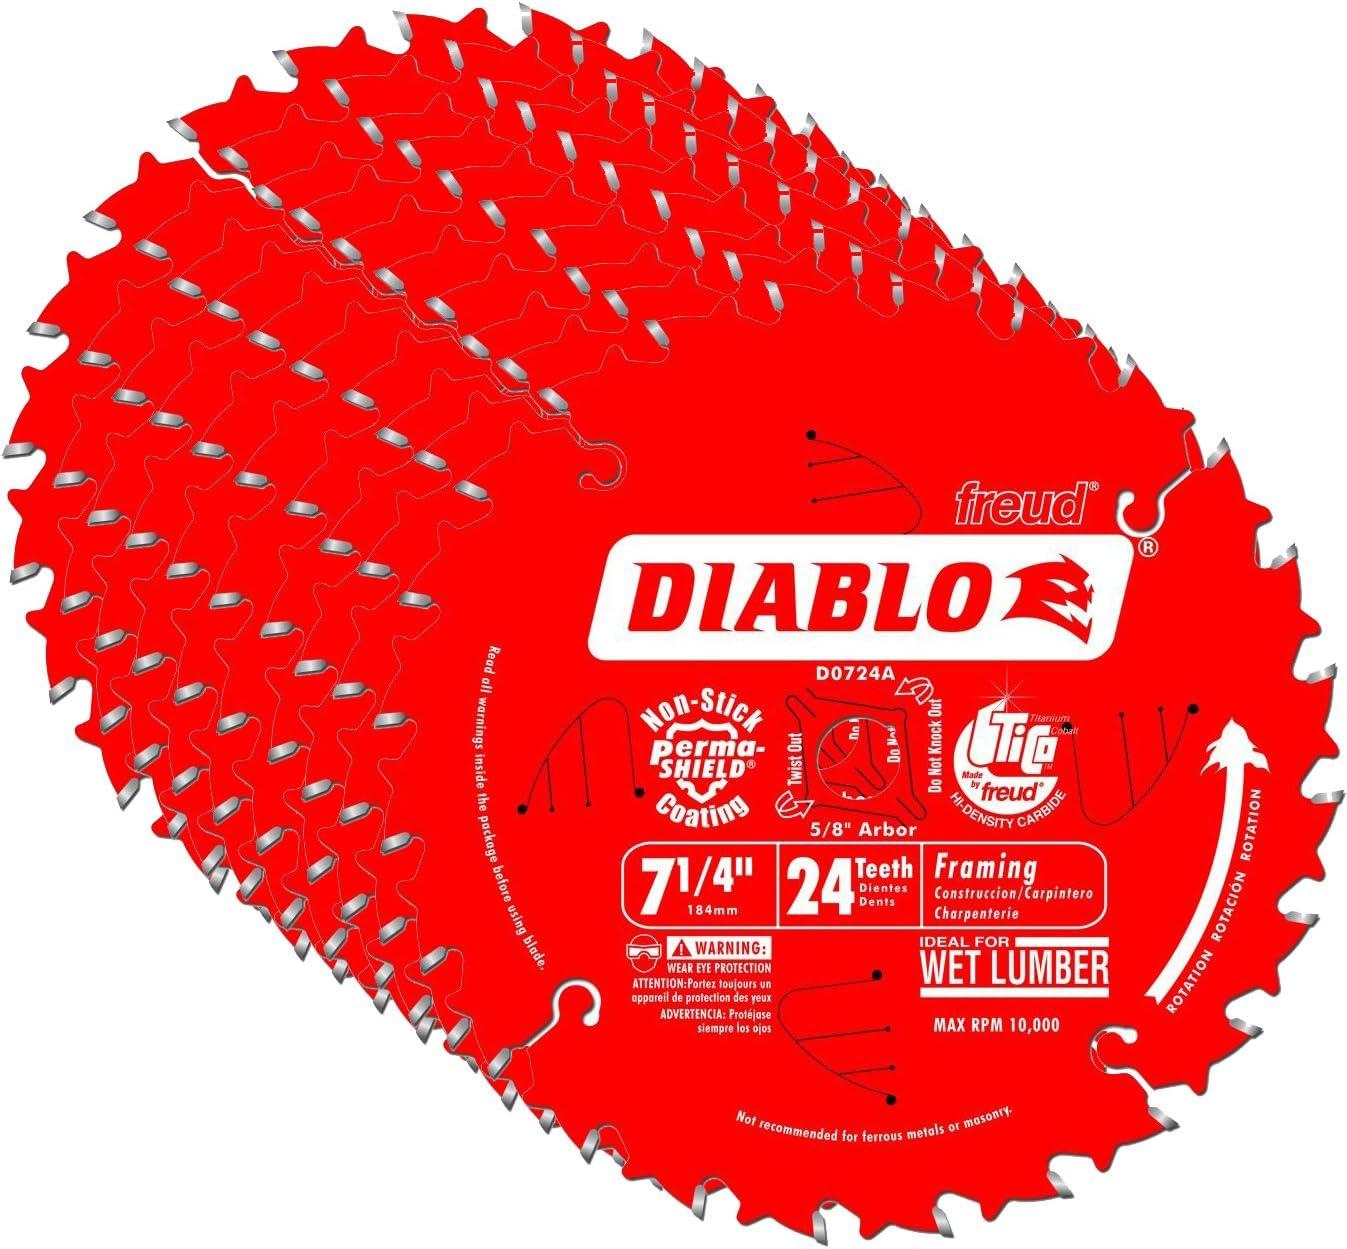 Diablo D0724A 7-1/4-Inch 24-Tooth Diablo Circular Saw Framing Blade